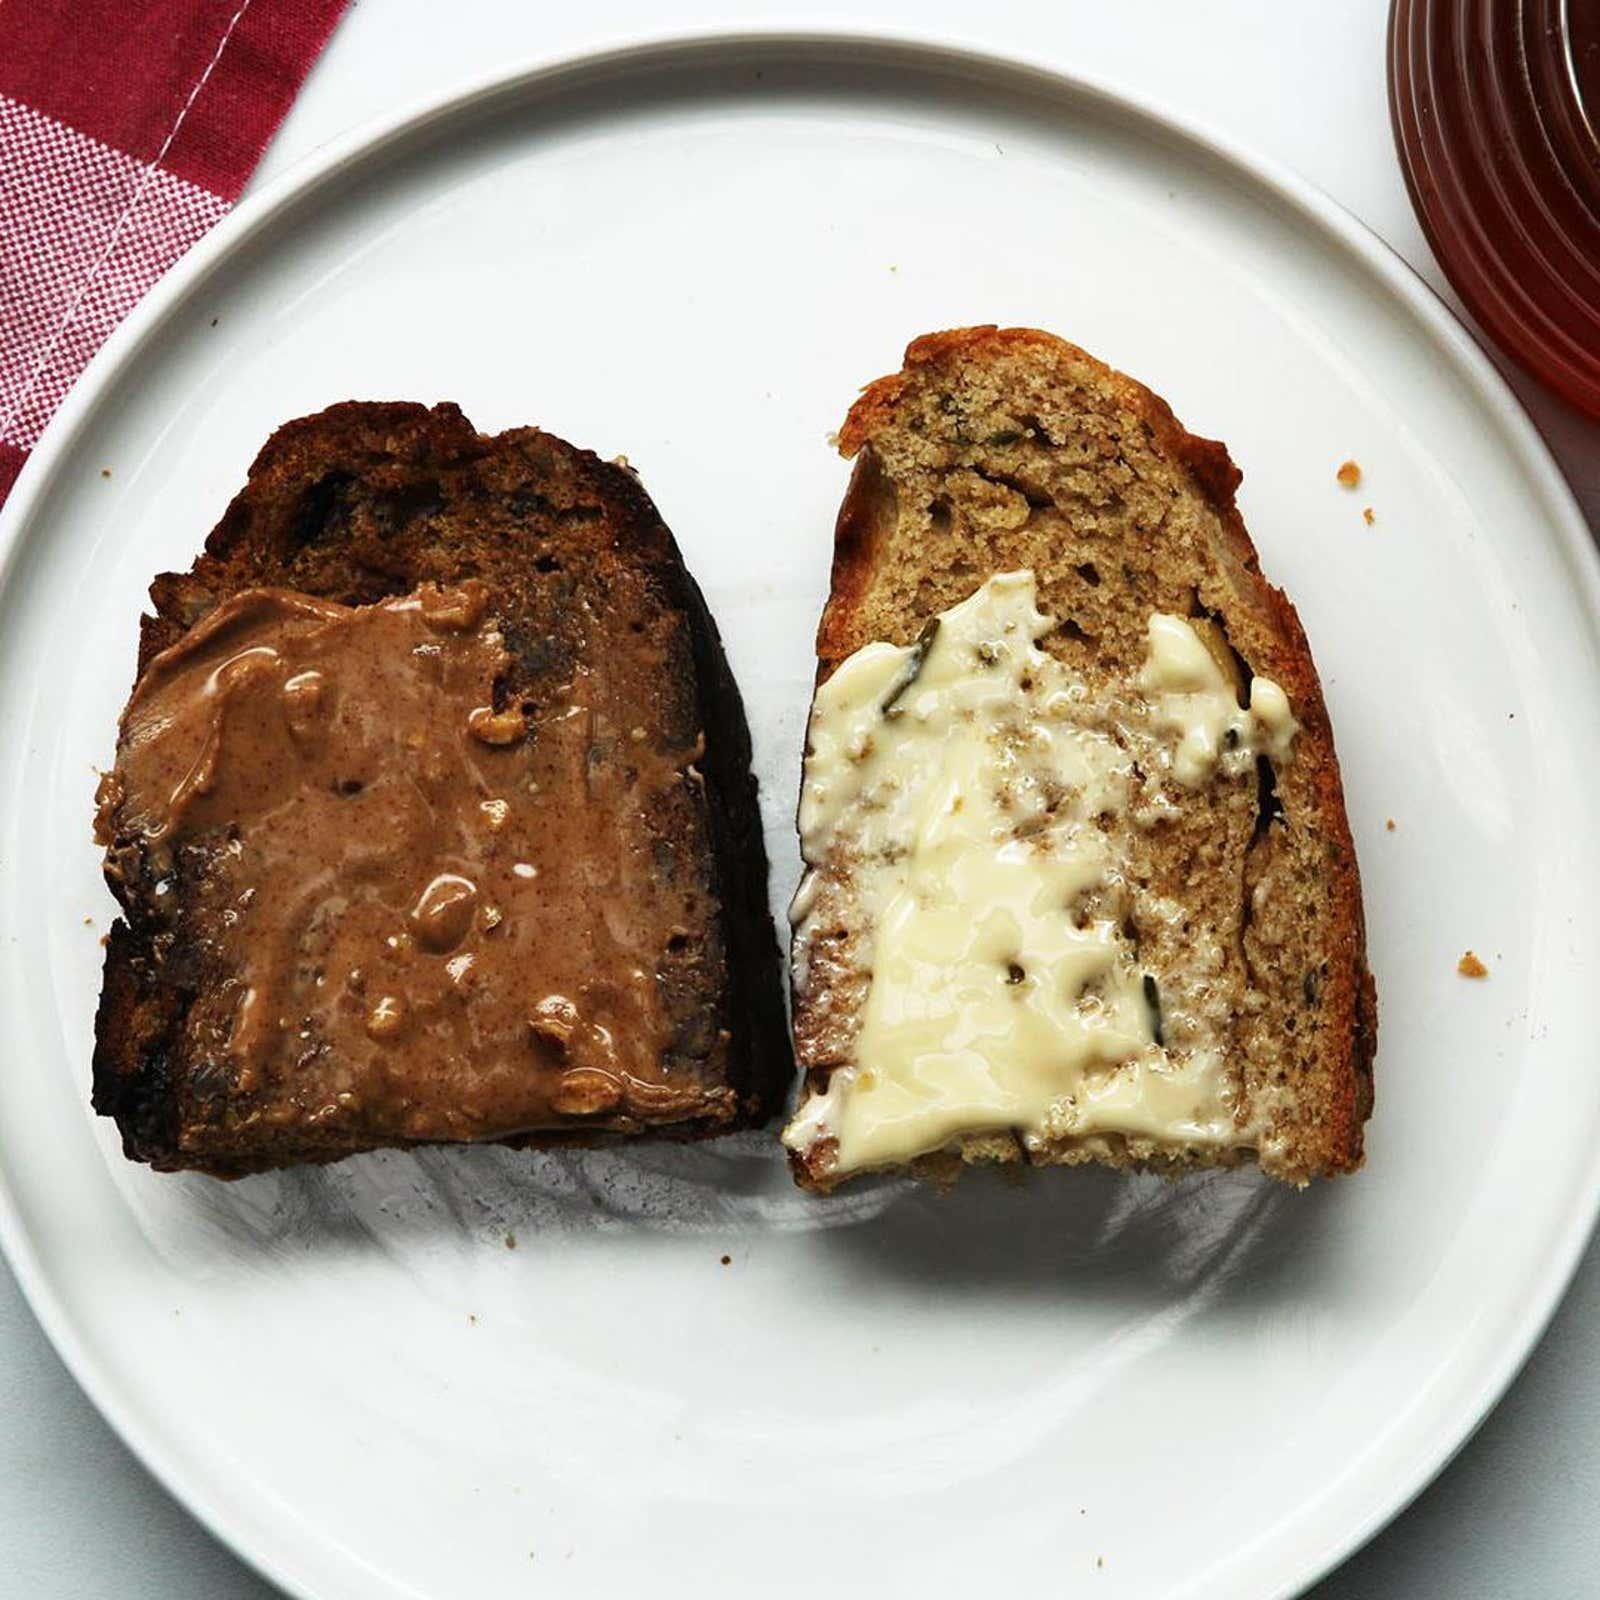 Roasted Rosemary Garlic Loaf